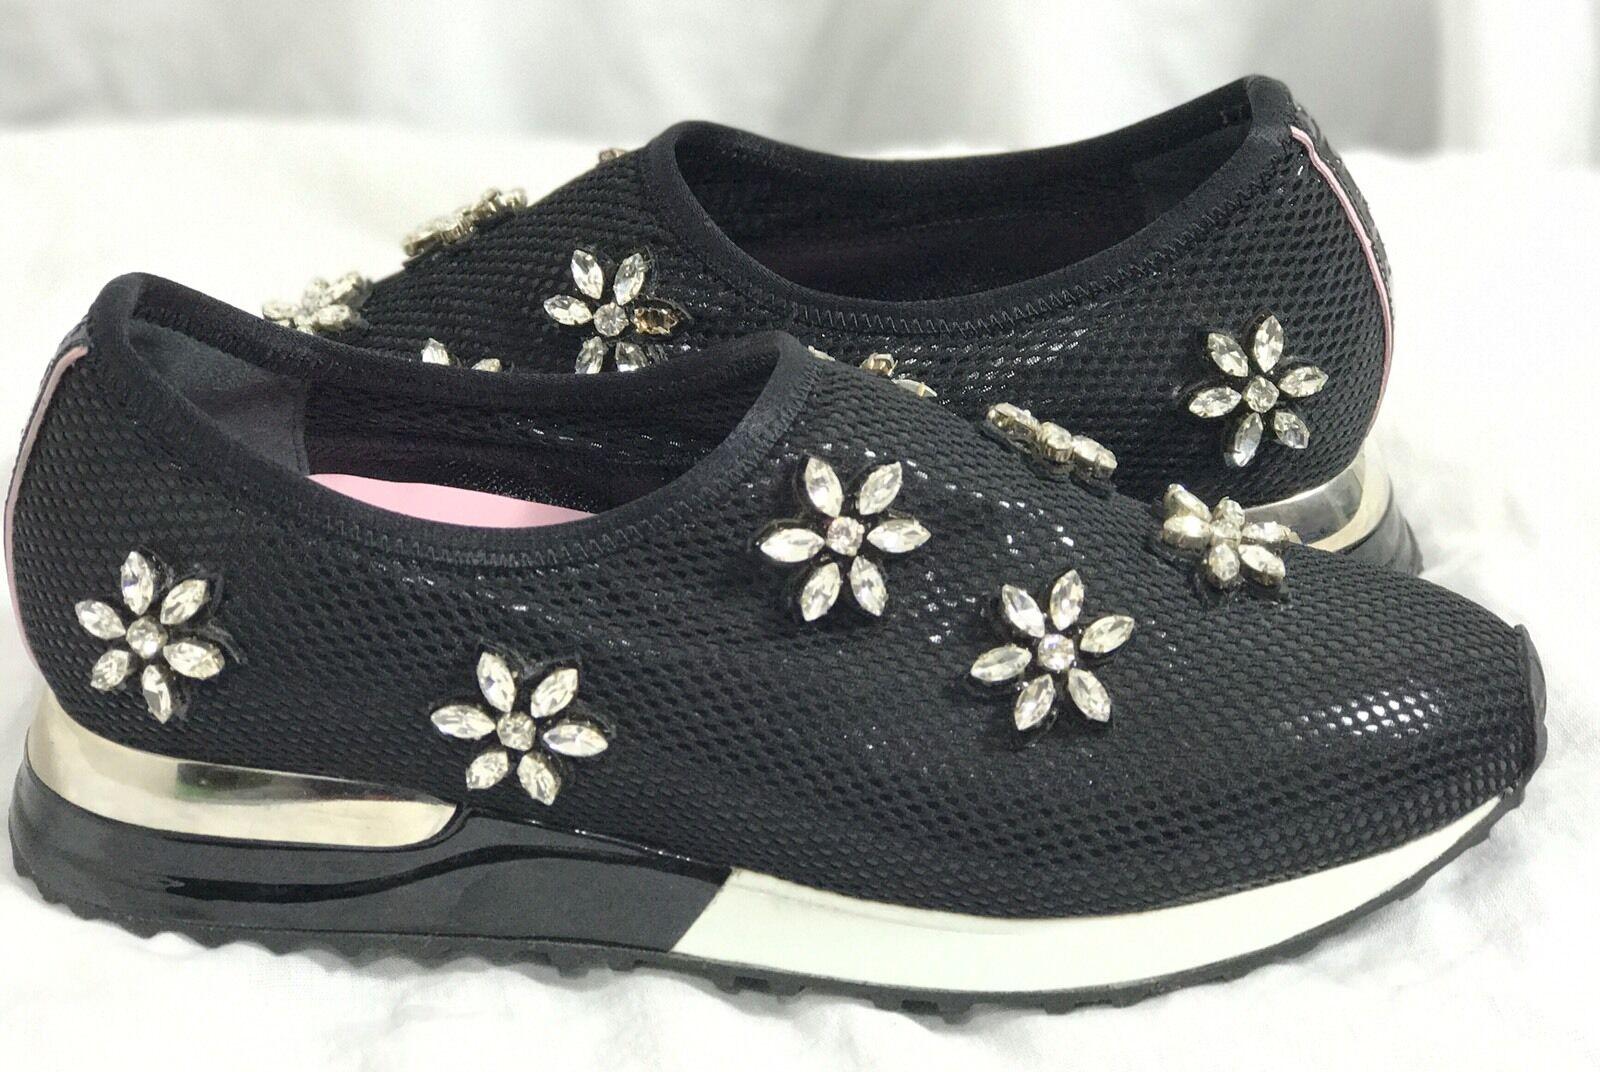 POLETTO Women's  ⭐️⭐️Swarovski Crystal ⭐️⭐️  Sneakers  Size 38 8